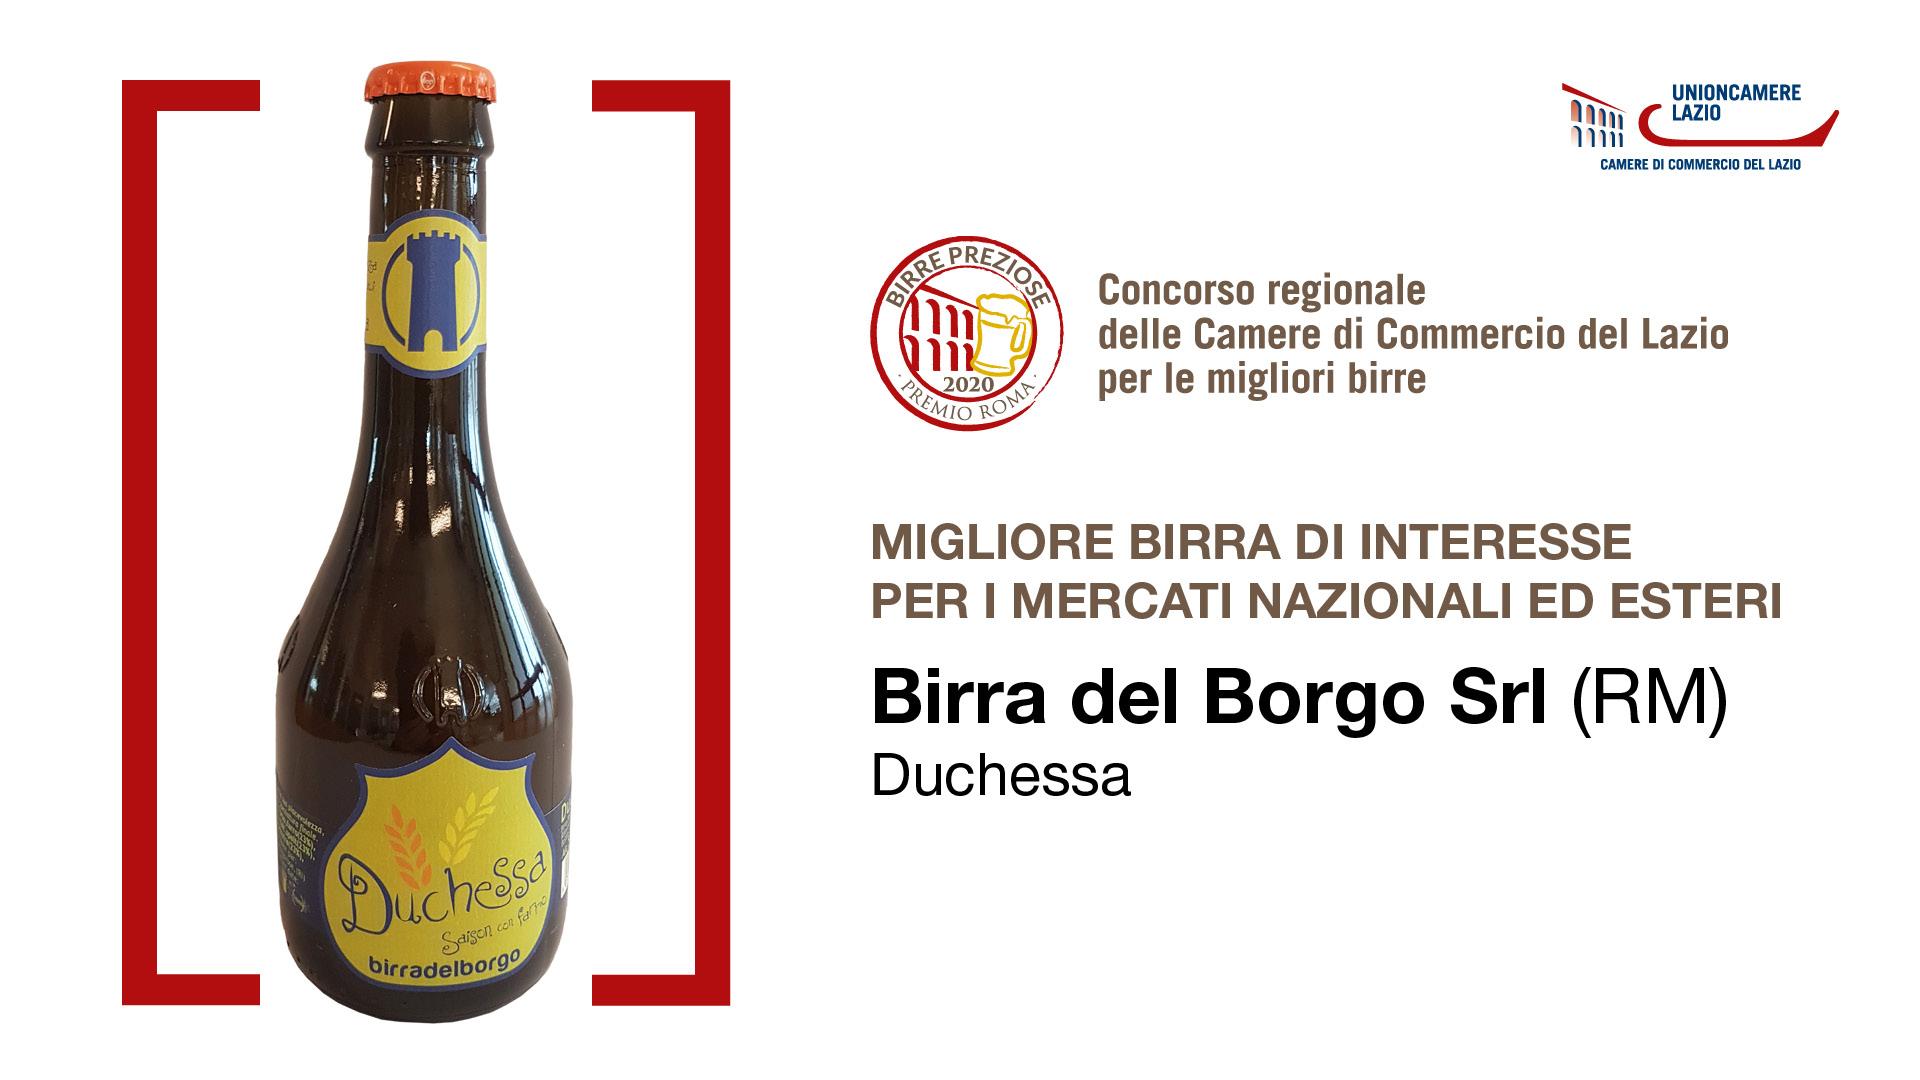 Birra del Borgo Srl (RM)